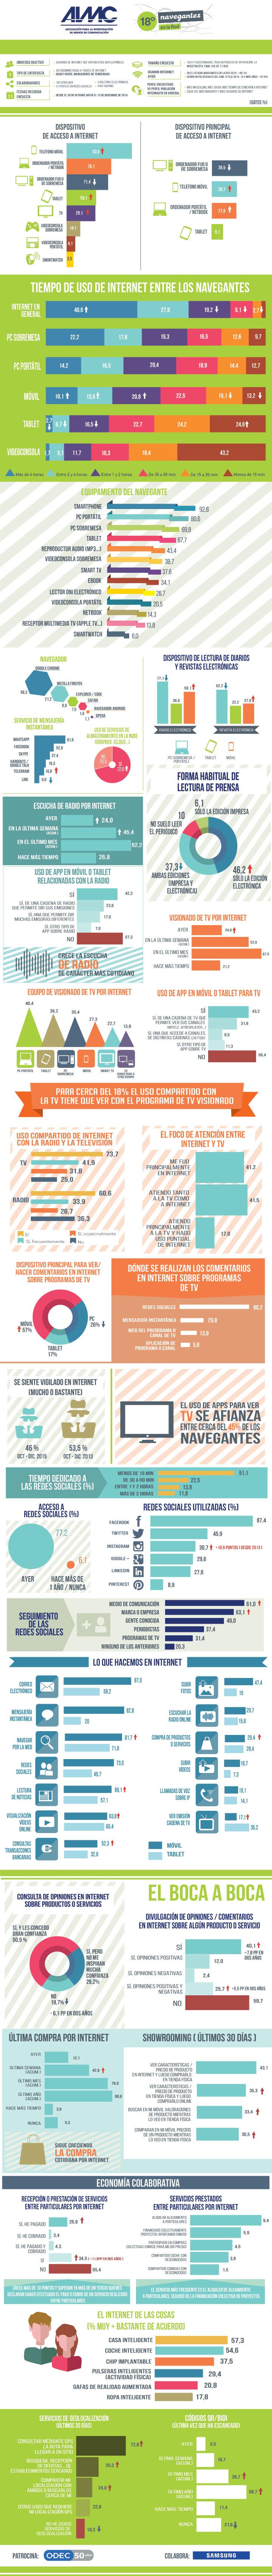 uso-internet-encuesta-aimc-infografia